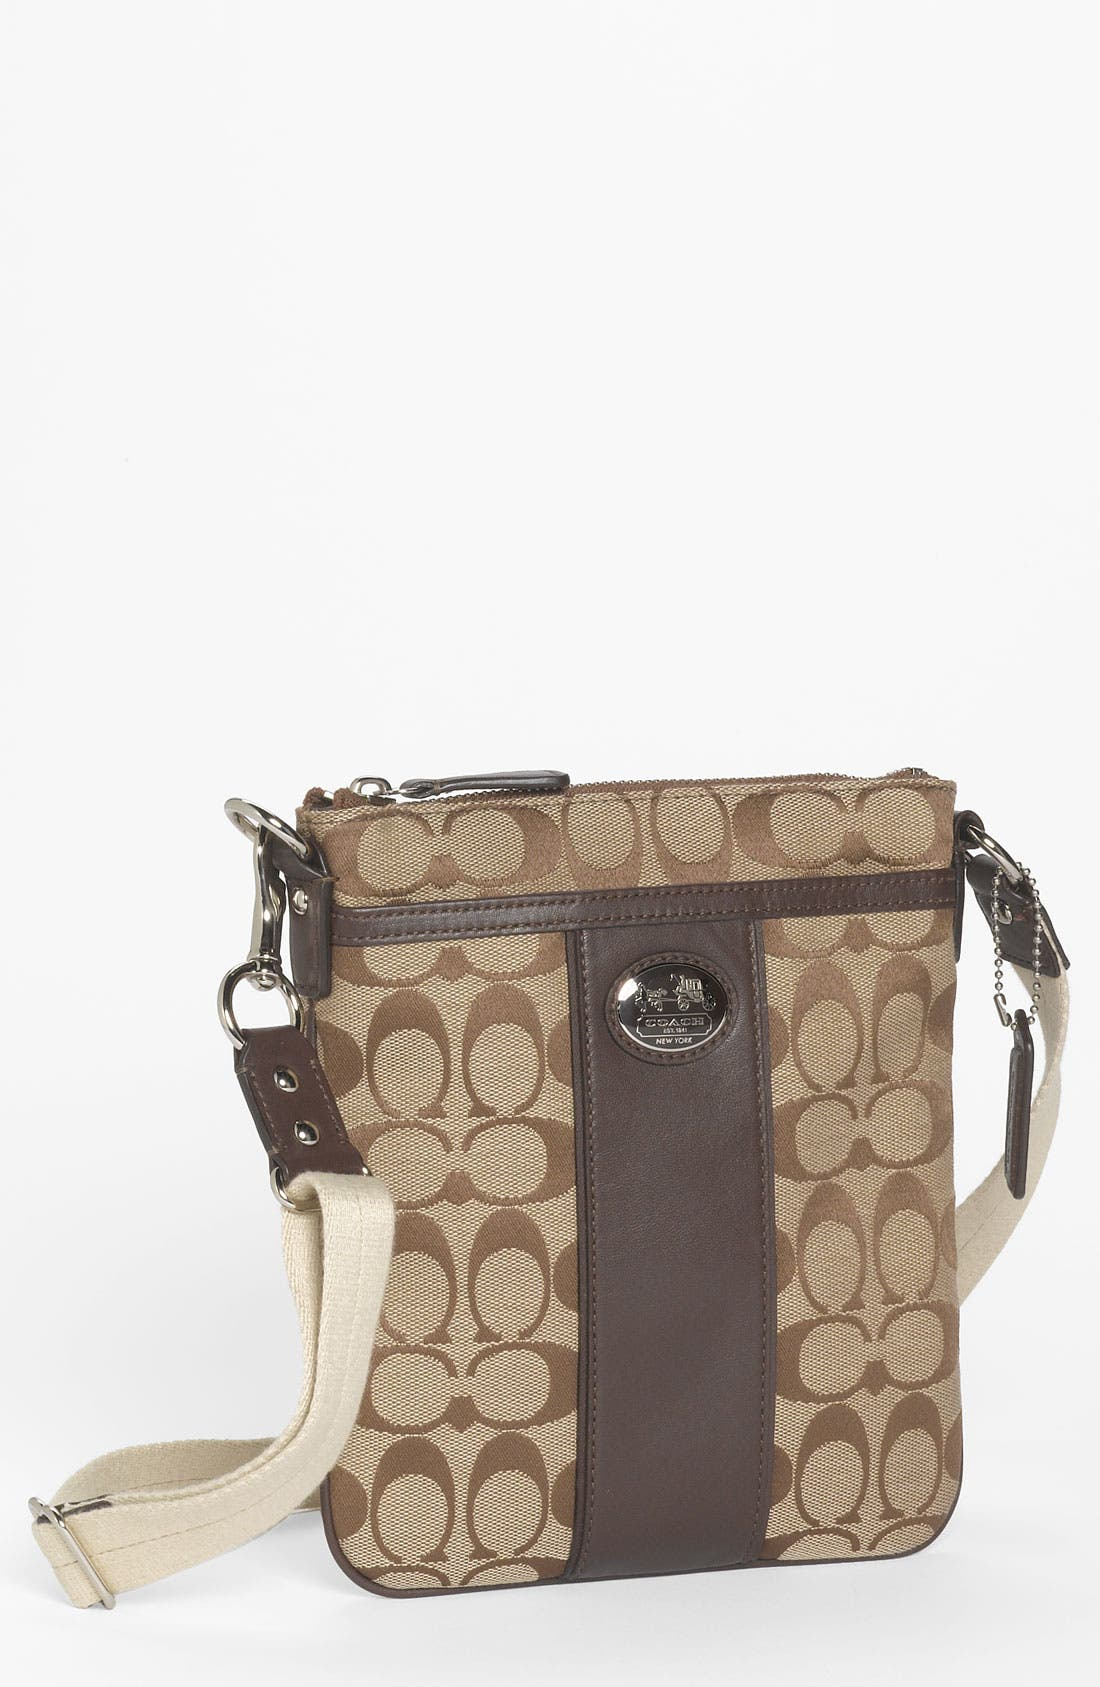 Main Image - COACH 'Sutton Signature - Swingpack' Crossbody Bag